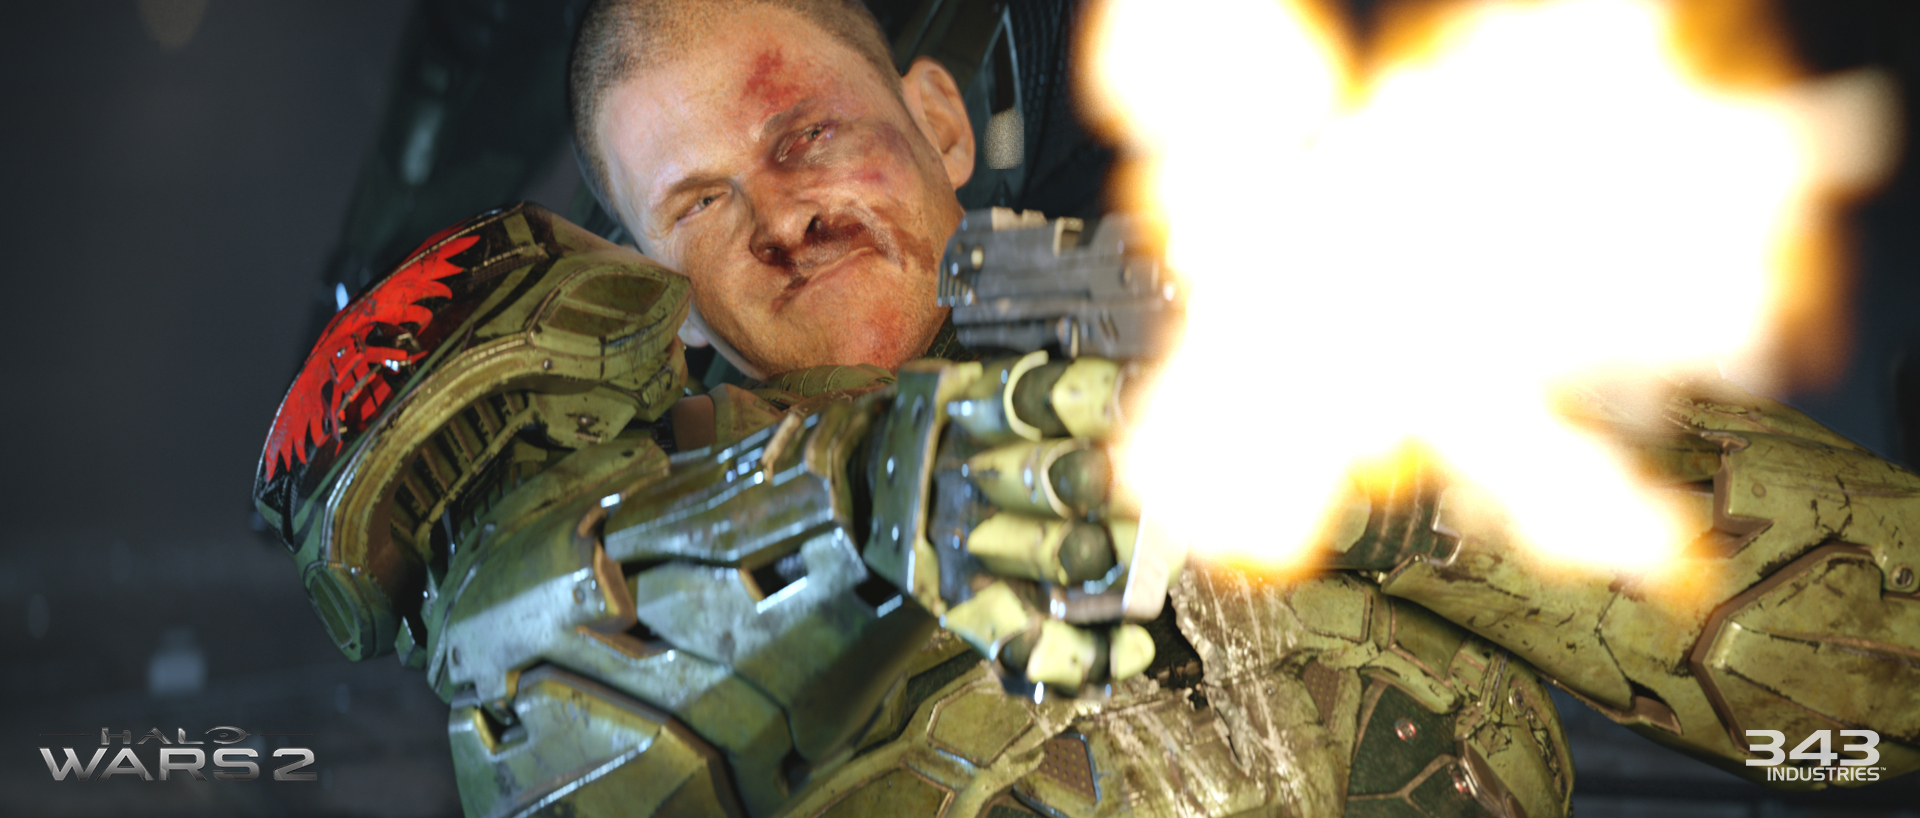 'Halo Wars 2' to Get Open Beta Next Week